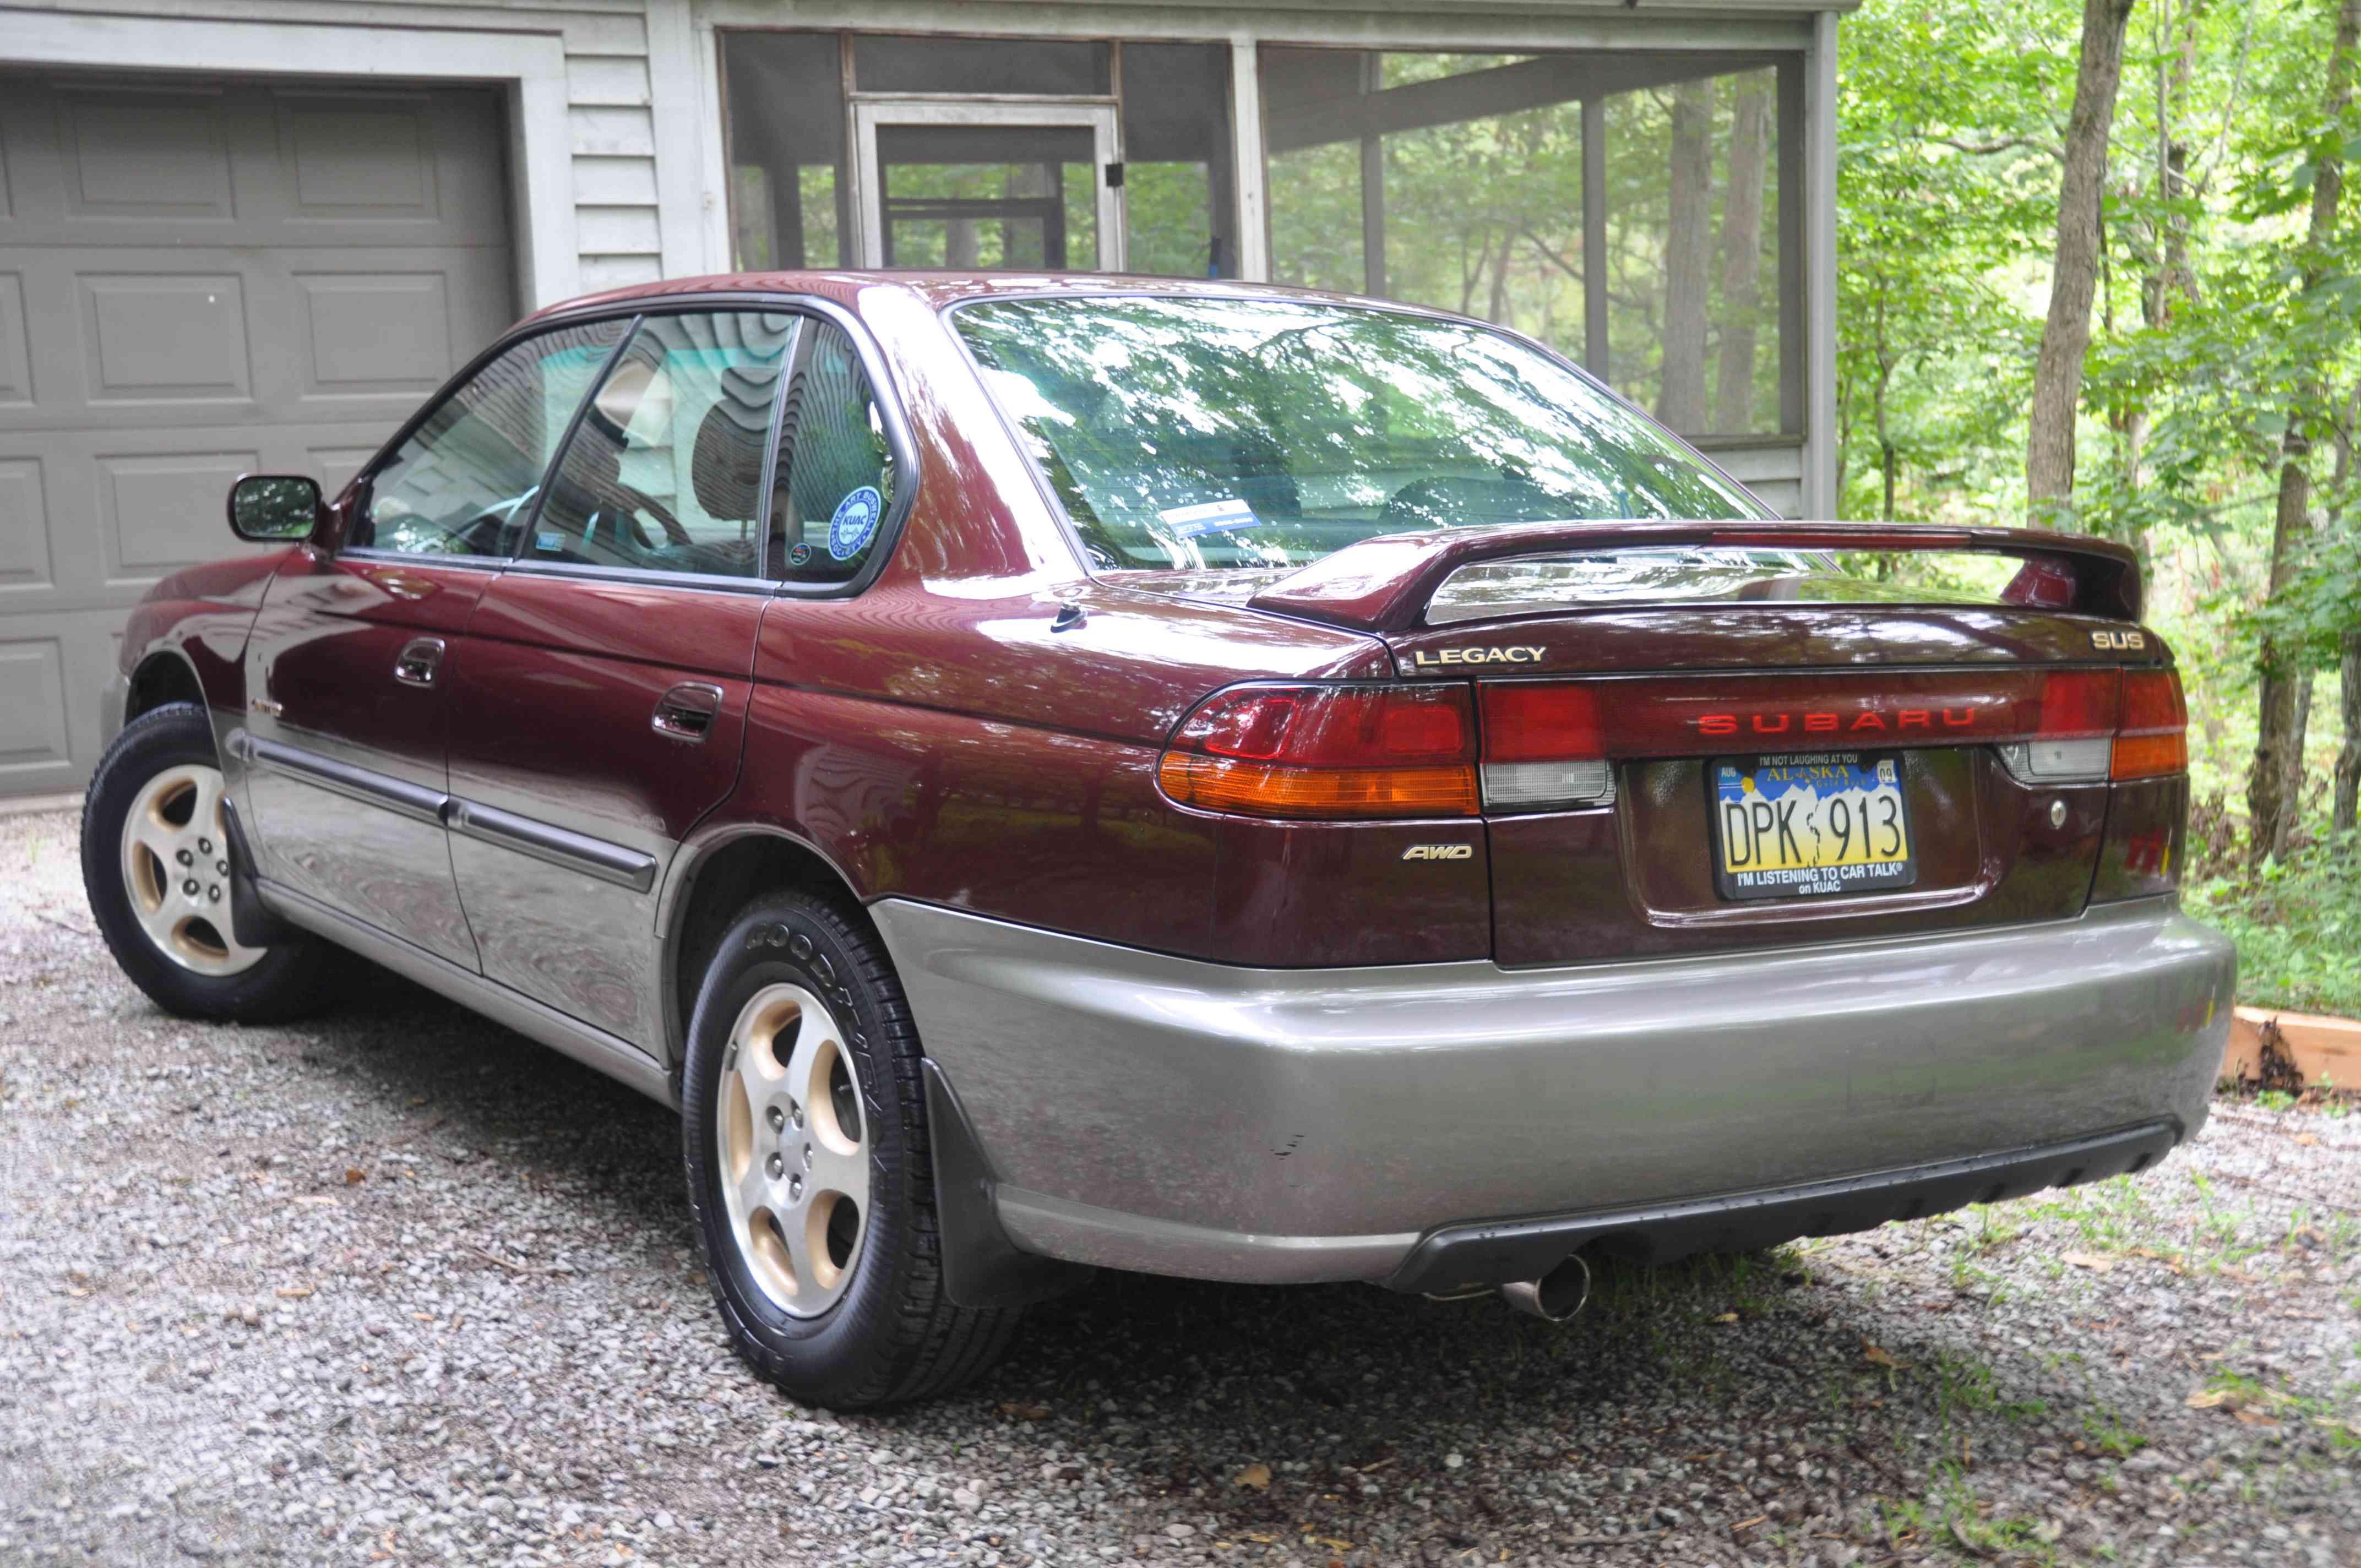 FS (IL) Parting Out 1999 Subaru Legacy SUS Sedan - Subaru ...